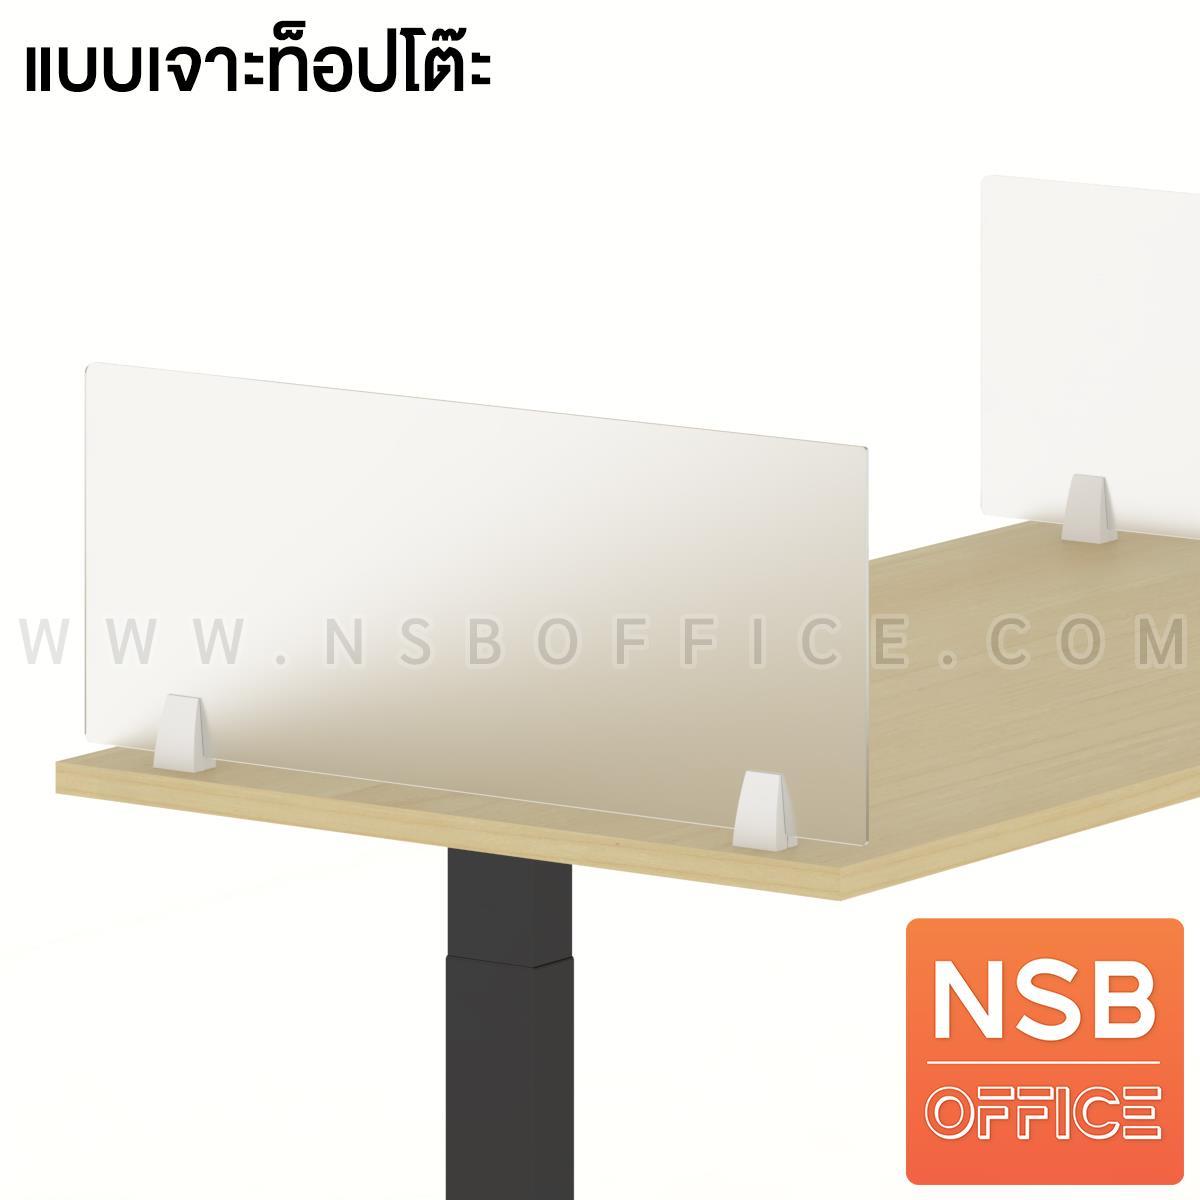 P04A020:มินิสกรีนกระจกแบบเจาะท็อป สูง 30 ซม. รุ่น NSB-M2  พร้อมตัวจับอลูมิเนียม